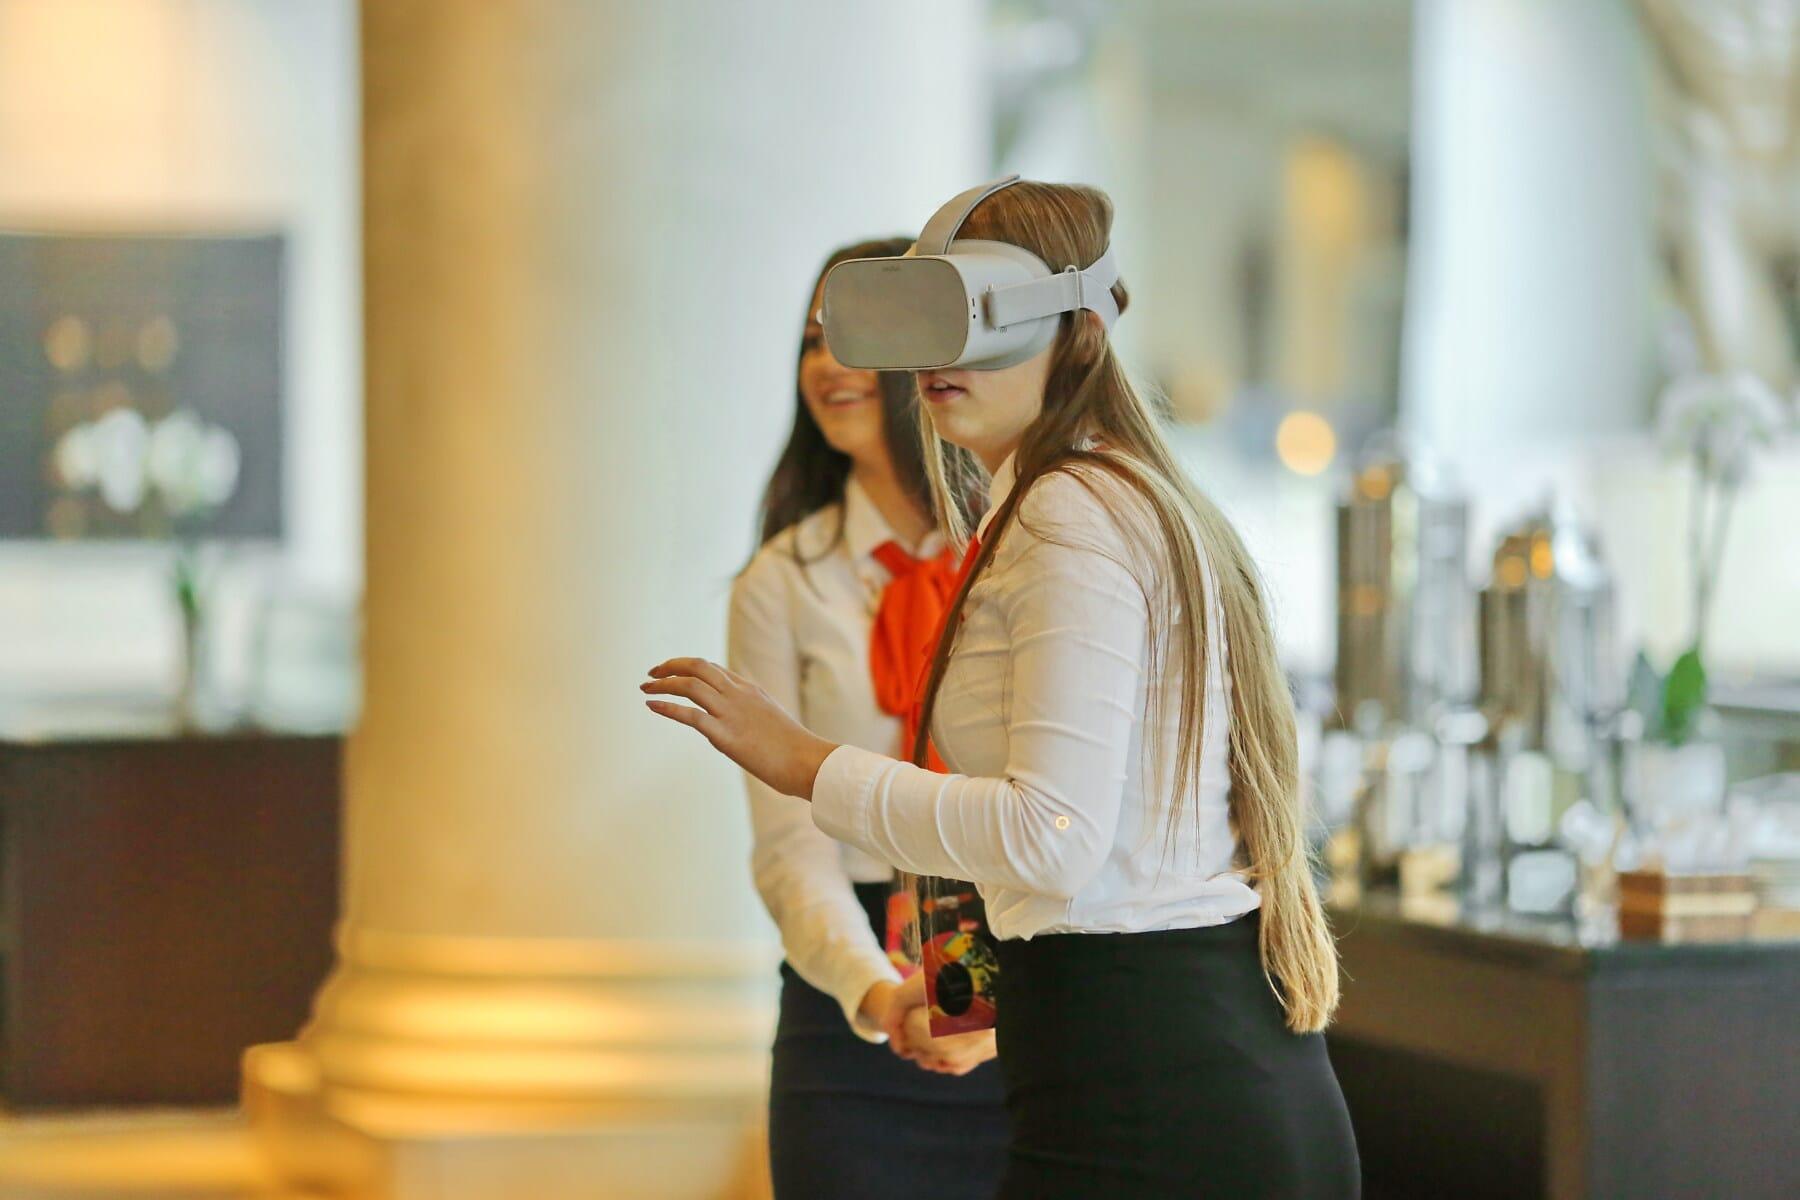 virtuelle Realität, Minianwendungen, Eyewear, Elektronik, Technologie, Mobiltelefon, Geschäftsfrau, Frau, drinnen